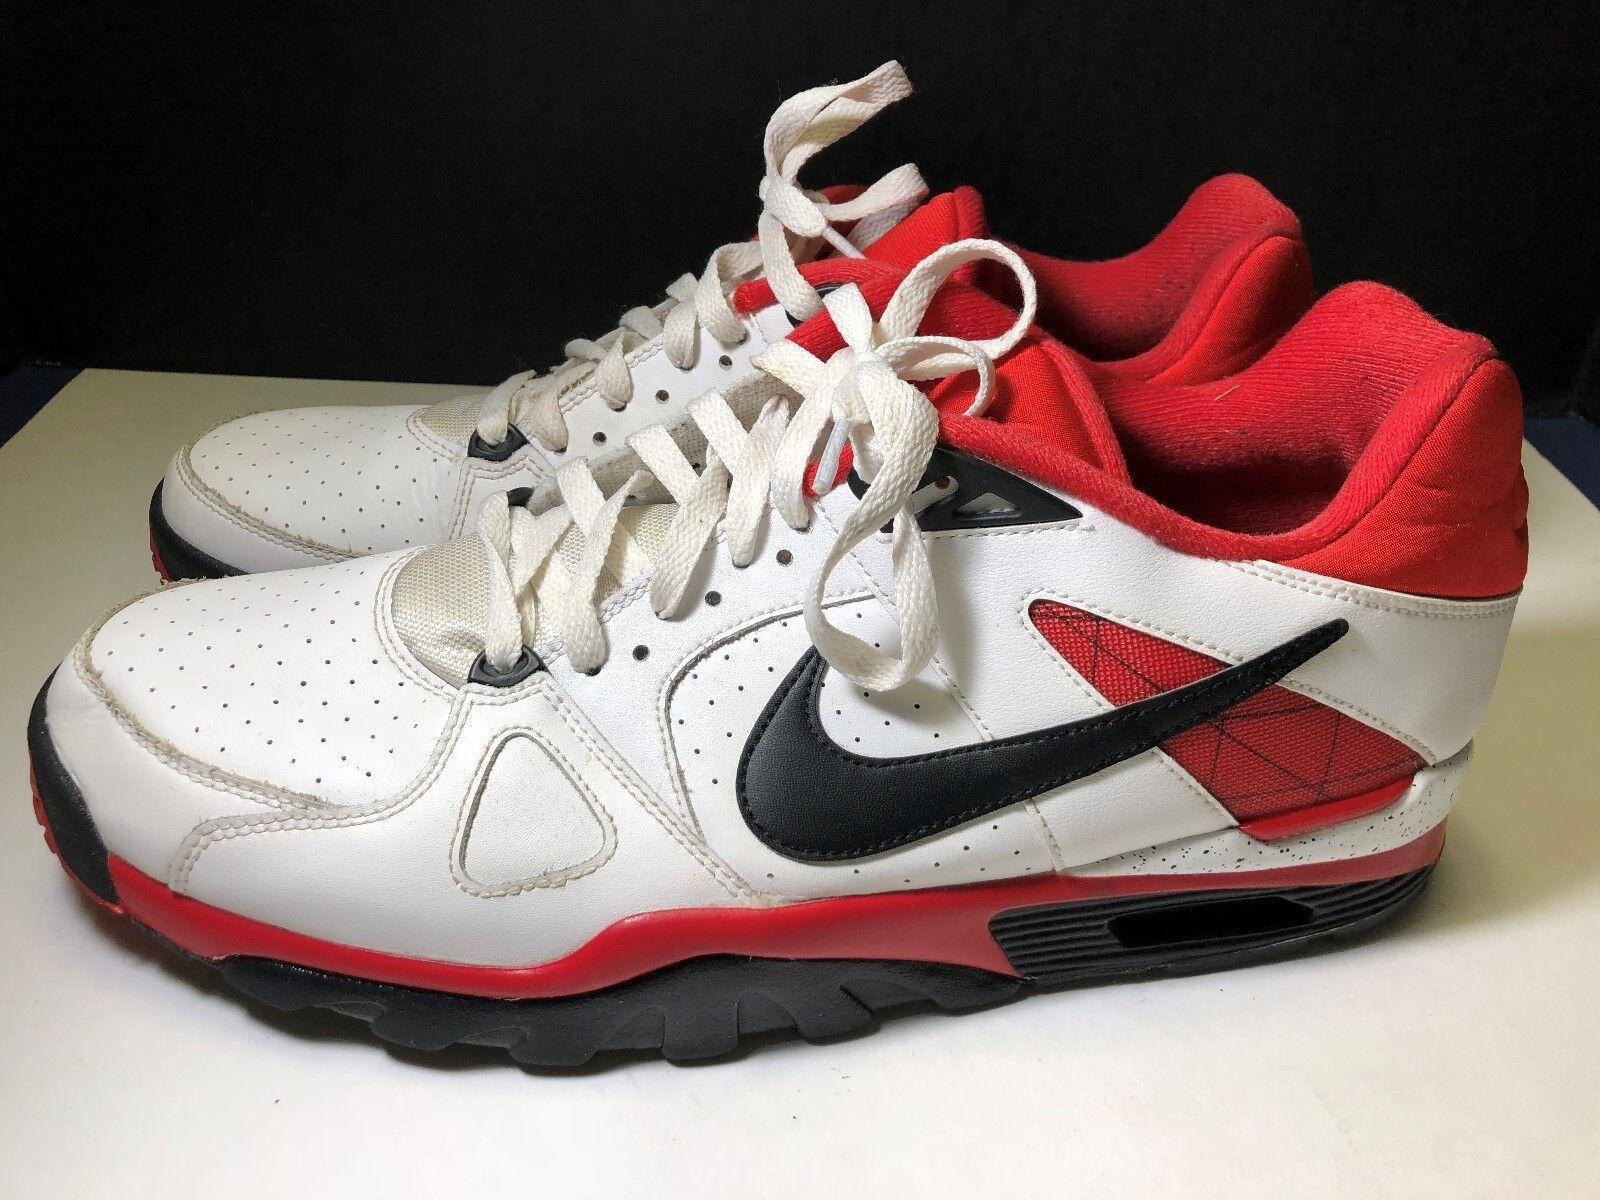 Hombre Nike Air Trainer rojo Classic Bo Jackson blanco rojo Trainer negro 488059-106 SZ 13 venta de liquidacion de temporada bca21b